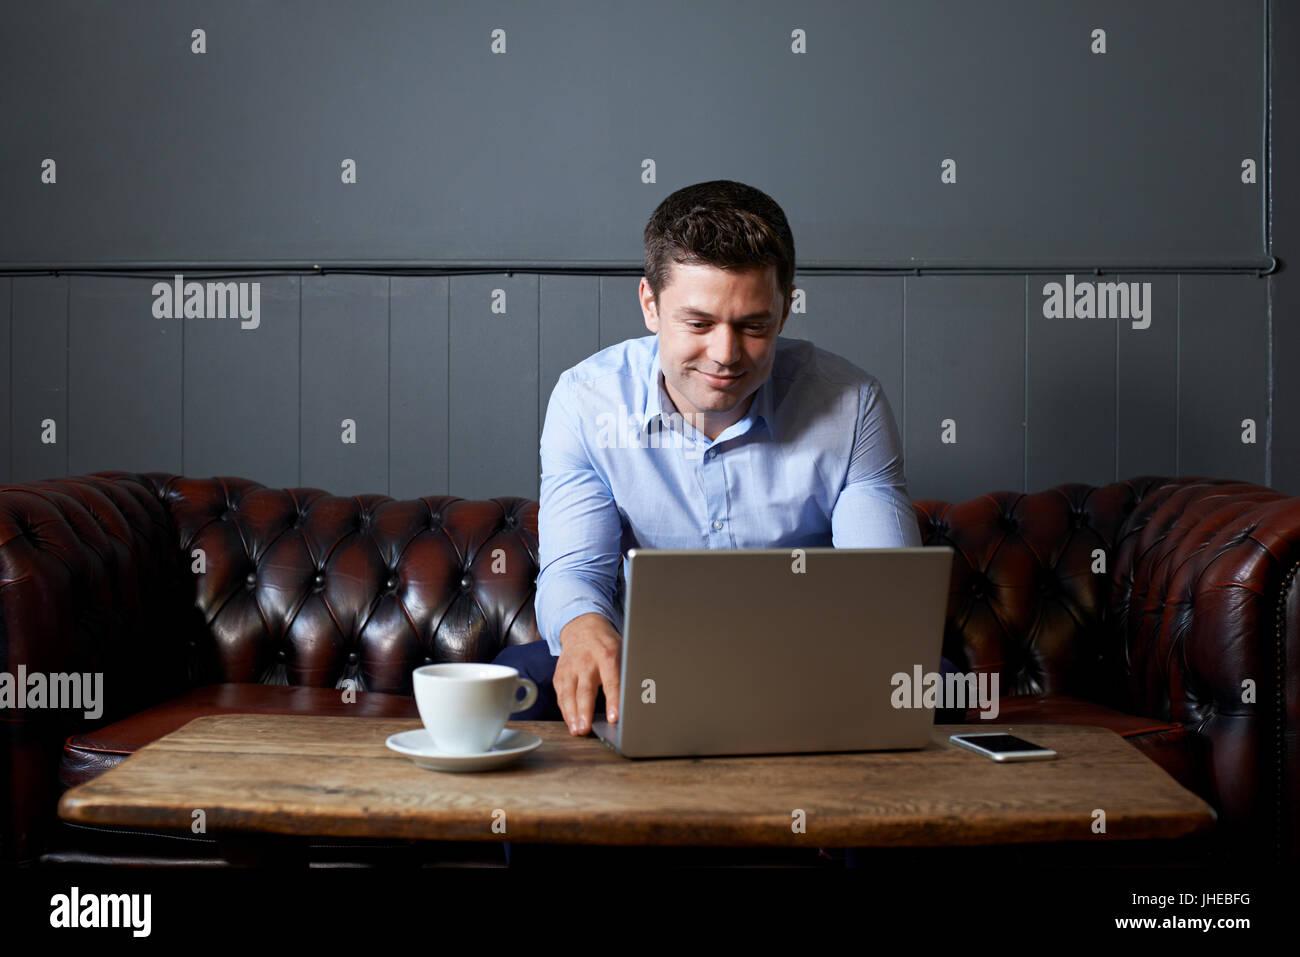 Mann arbeitet am Laptop im Internet-Cafe Stockbild